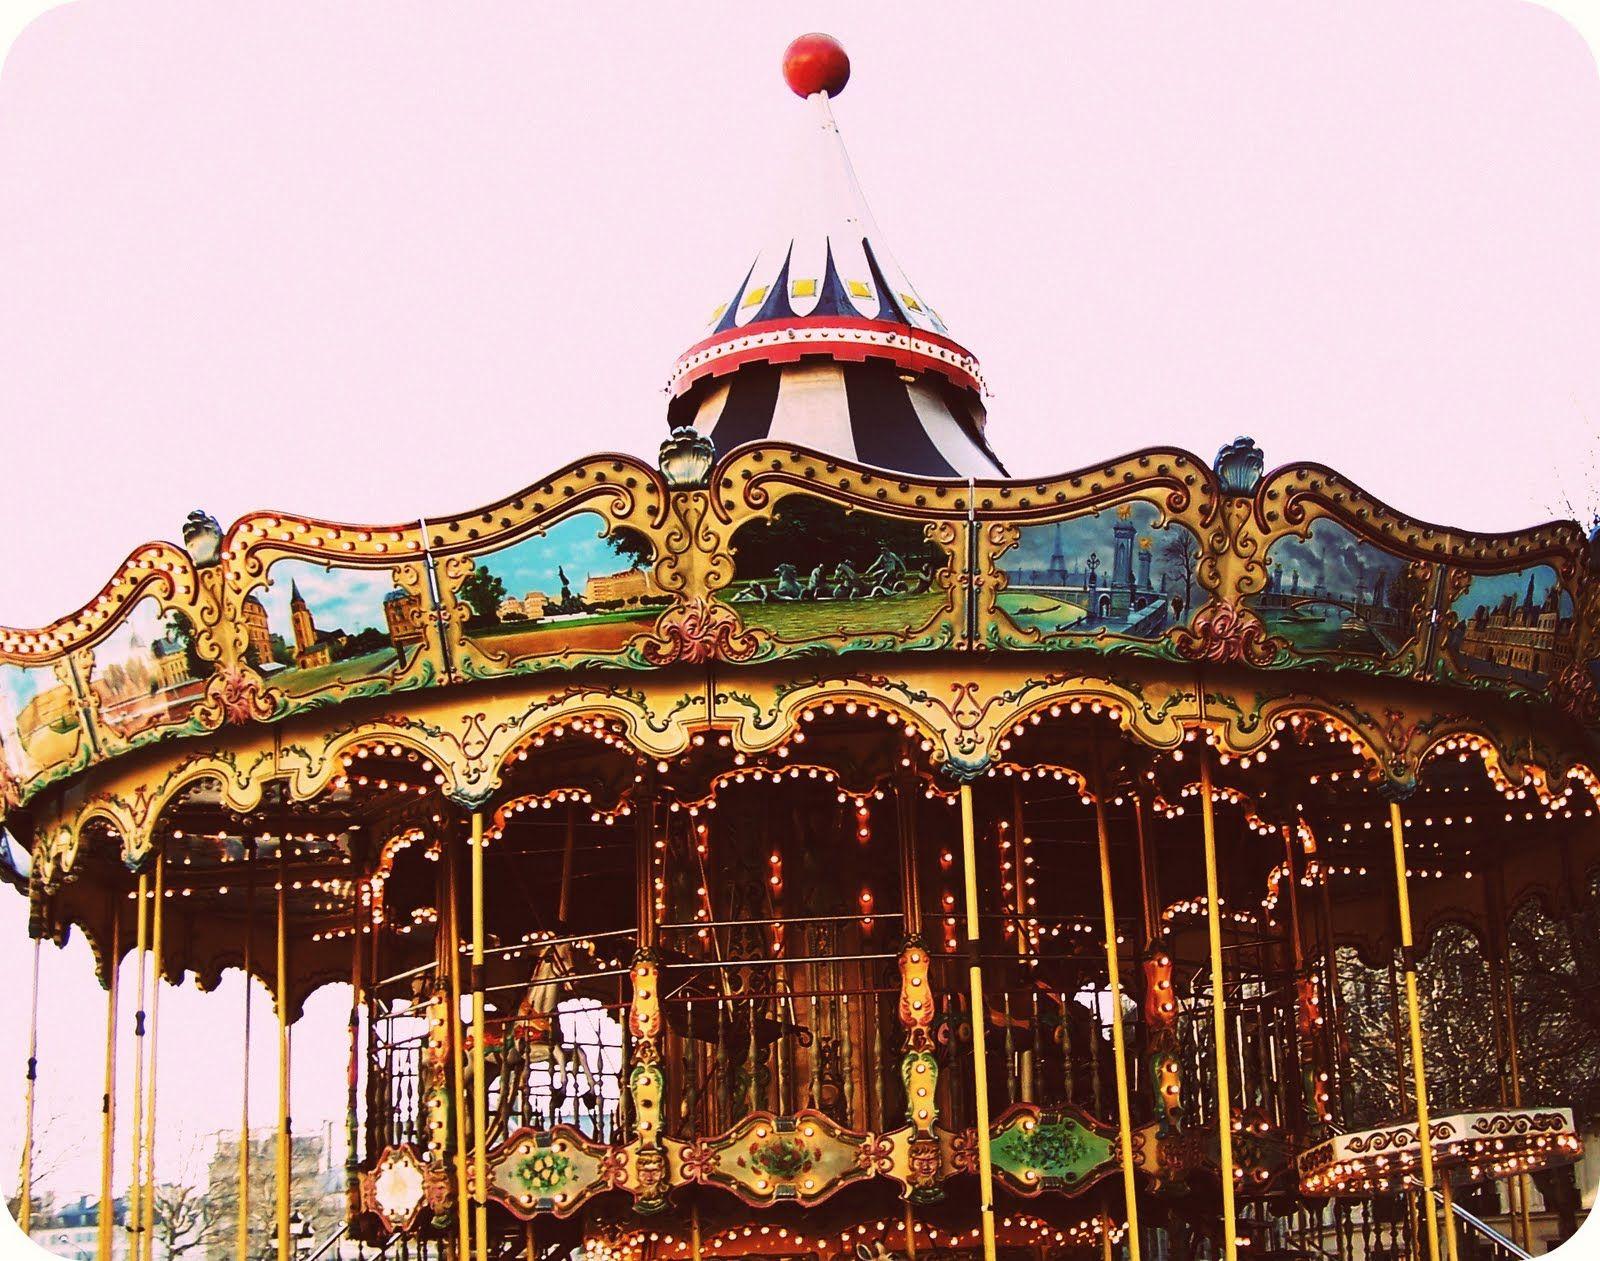 vintage carousel - Google Search | Kid art | Pinterest ...